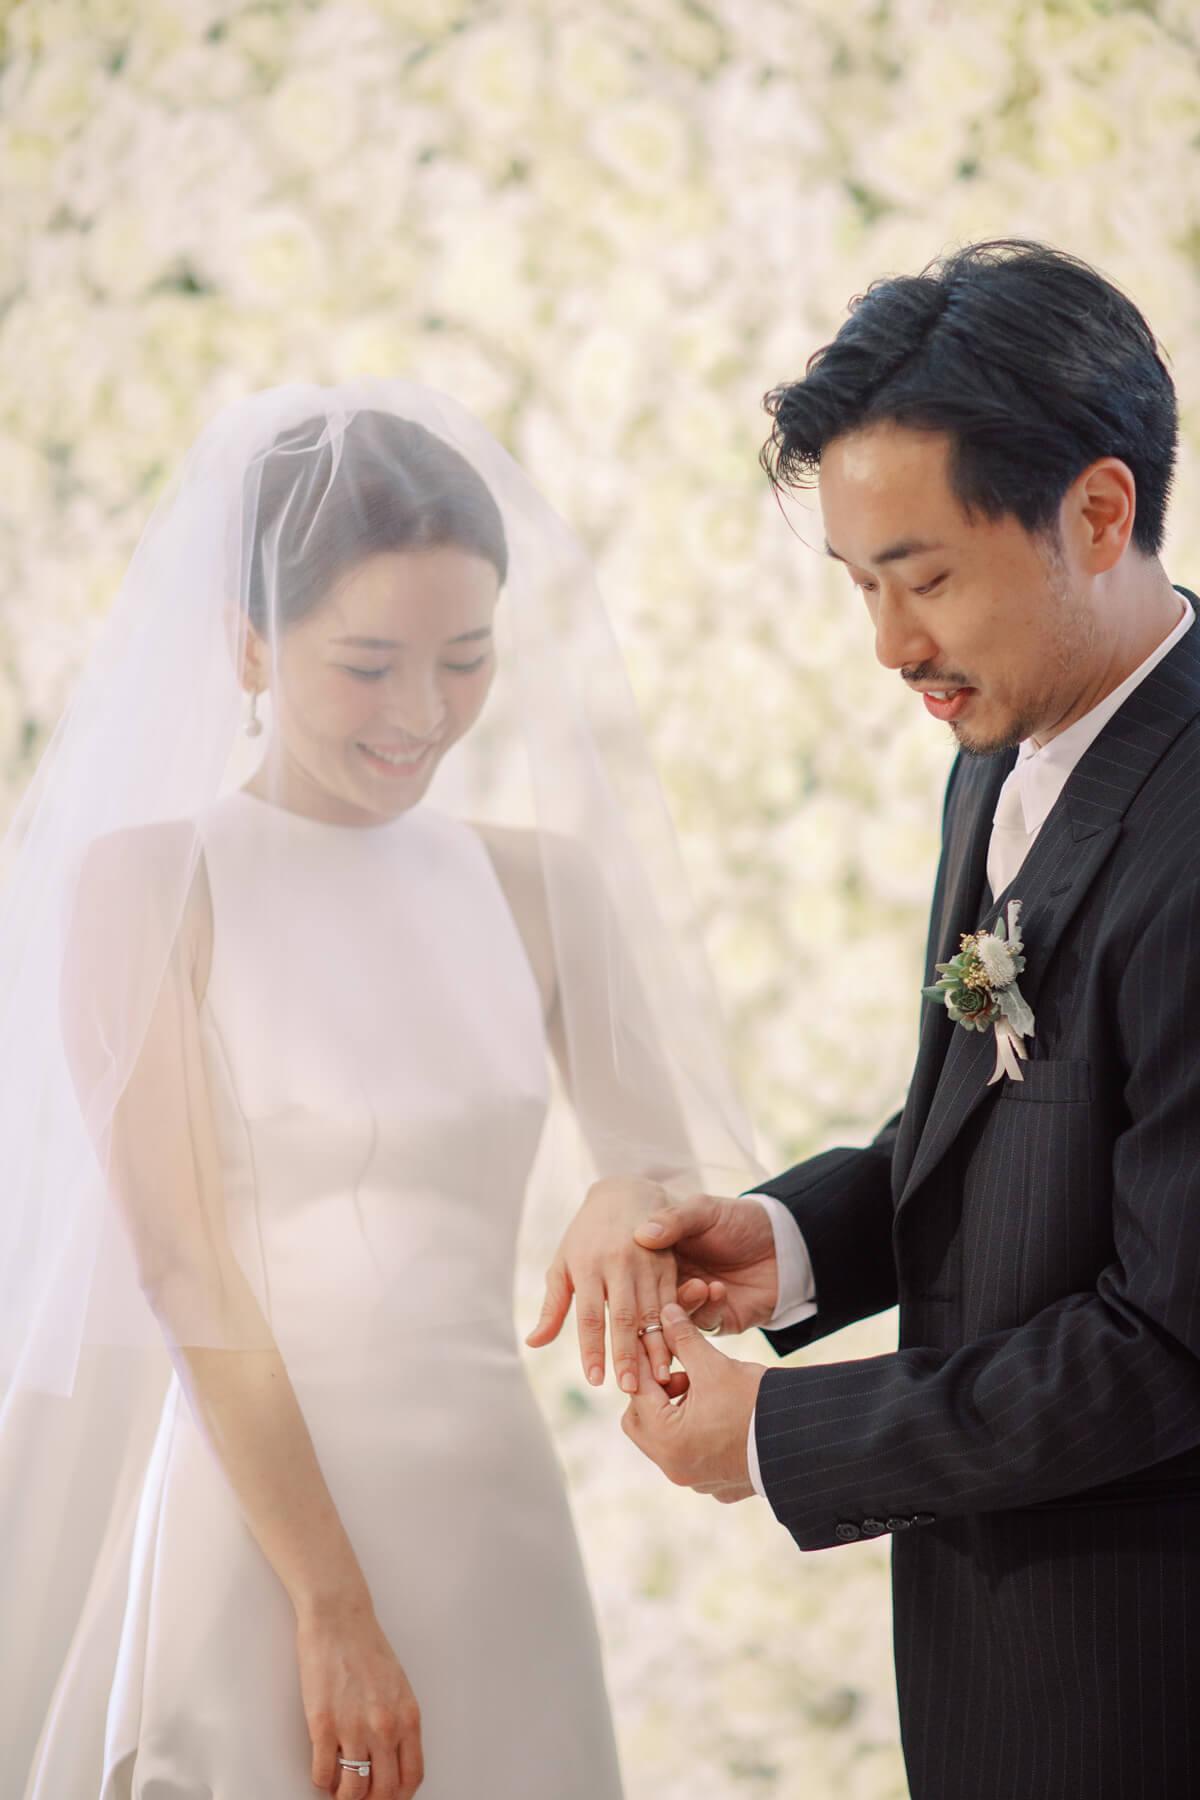 nikkiloveu-hongkong-weddingday-theupperhouse-as-014.jpg